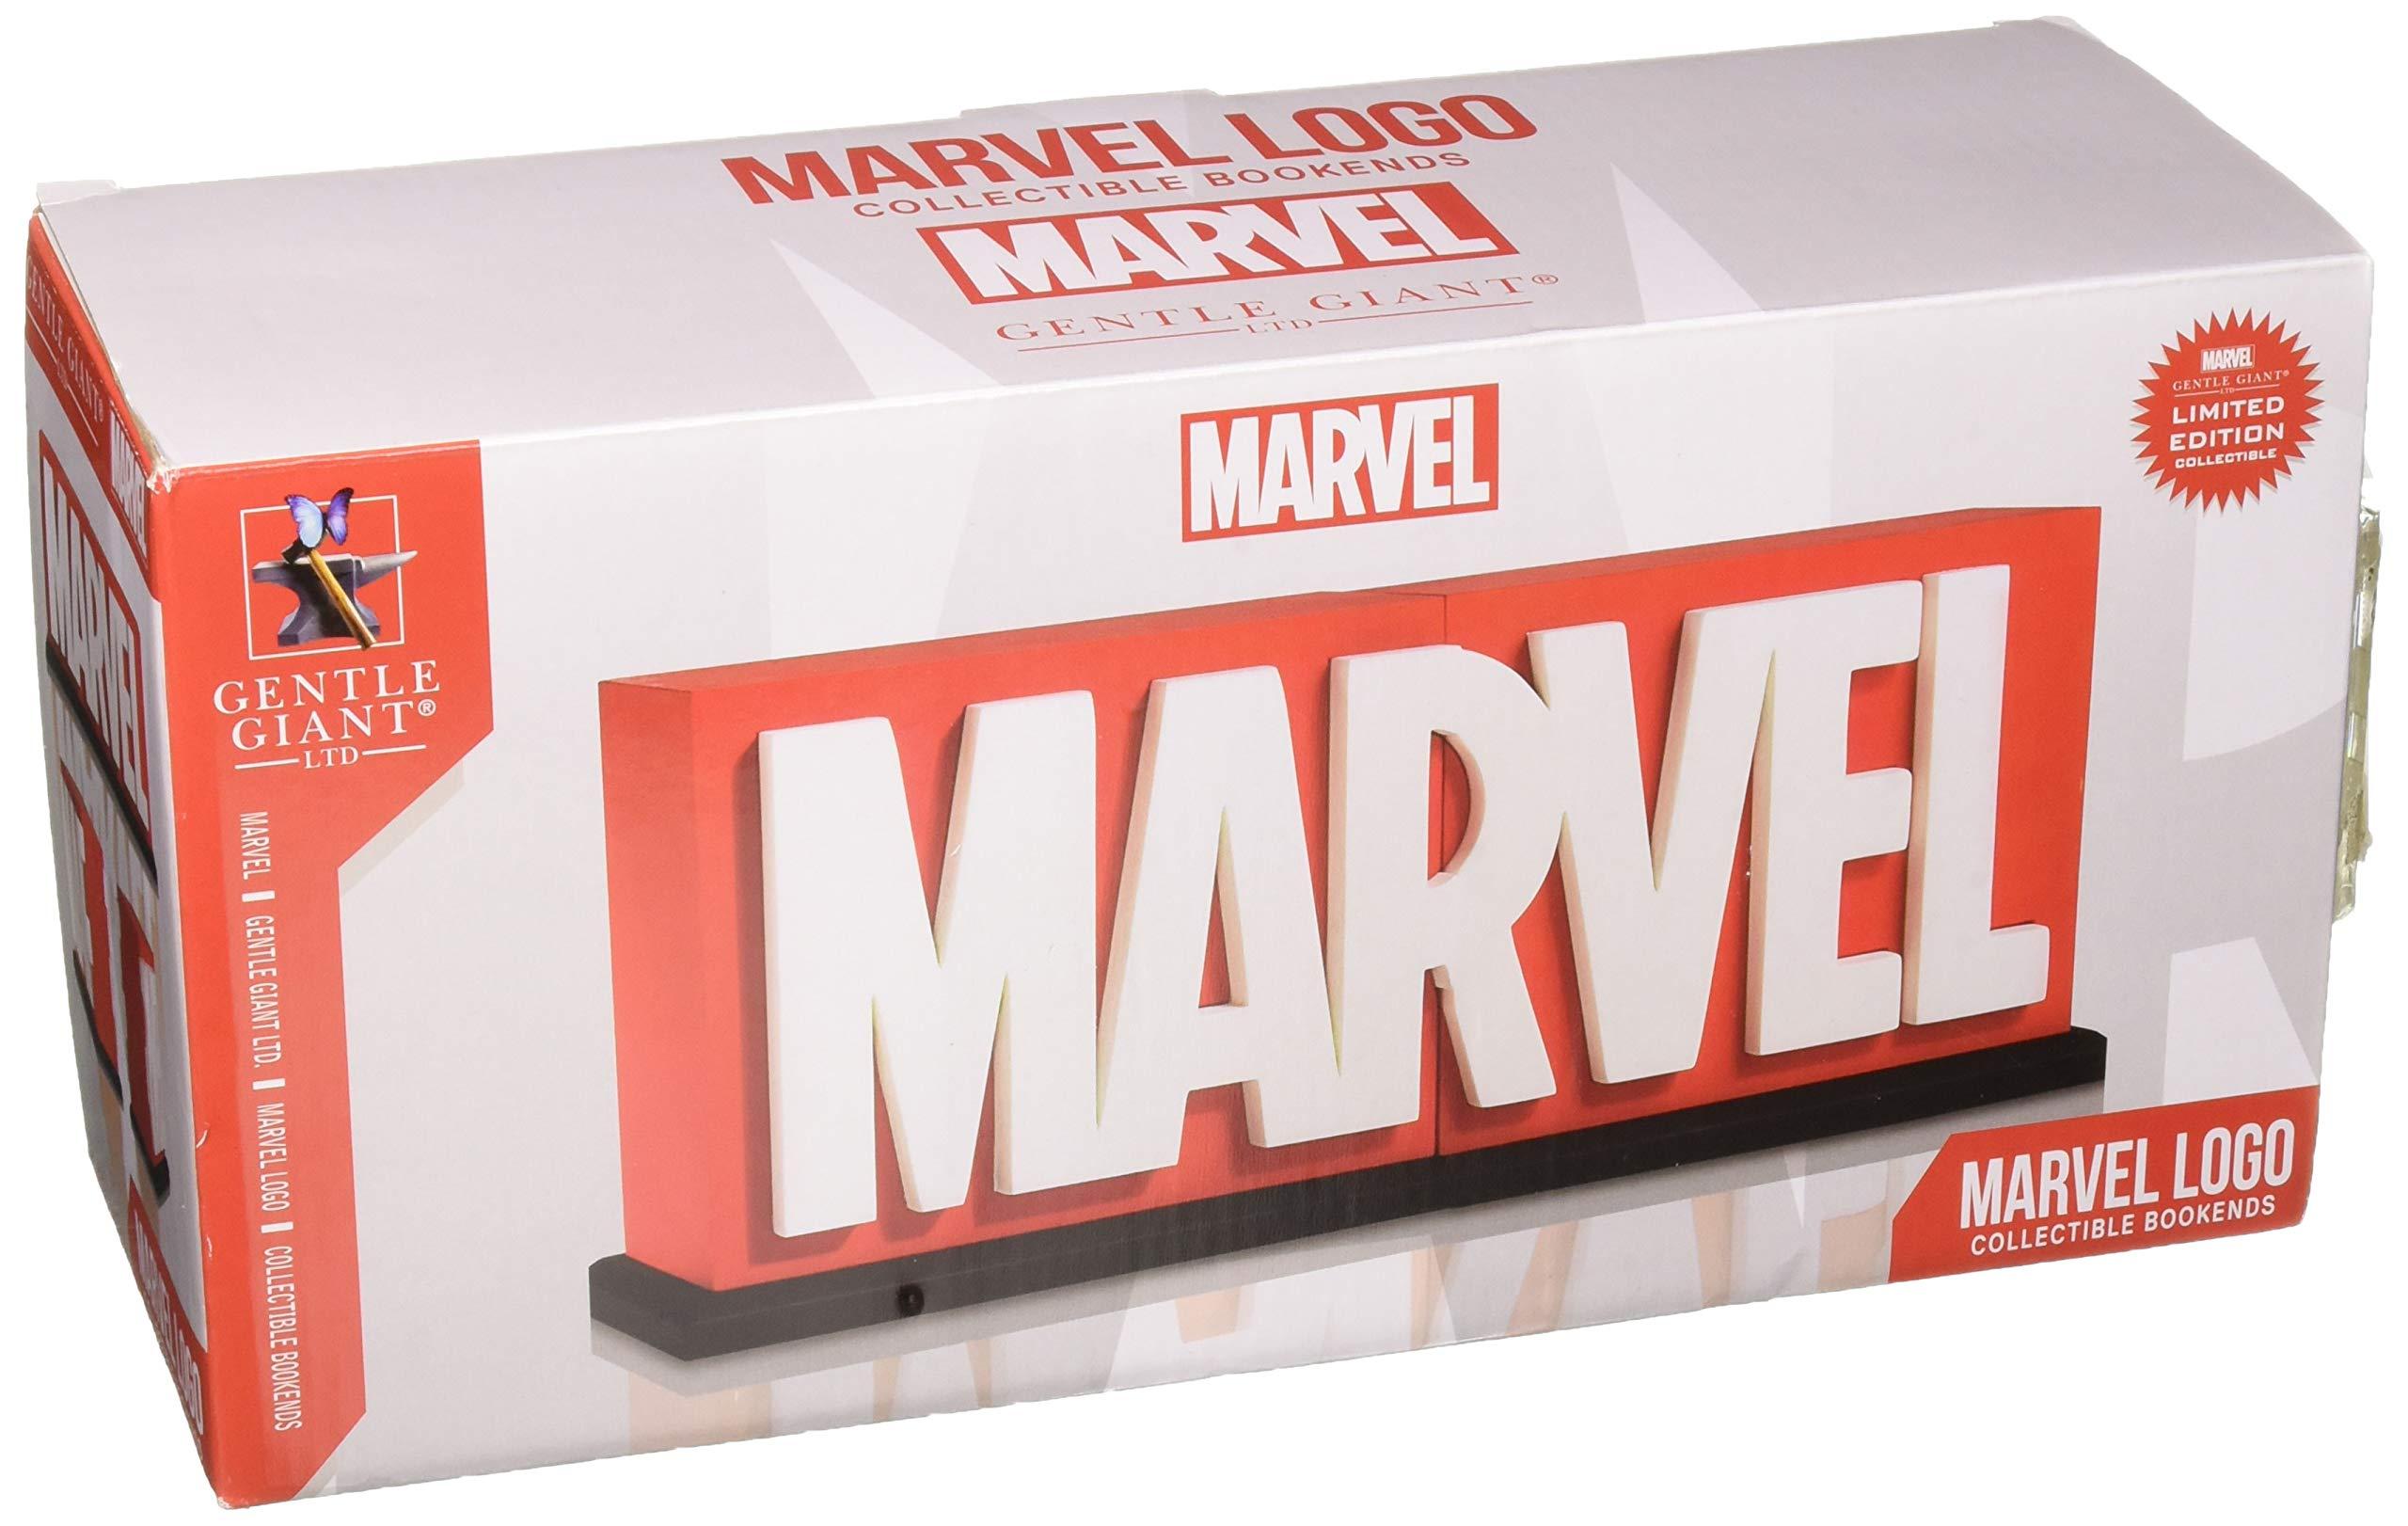 Gentle Giant Marvel Logo Bookends Statue